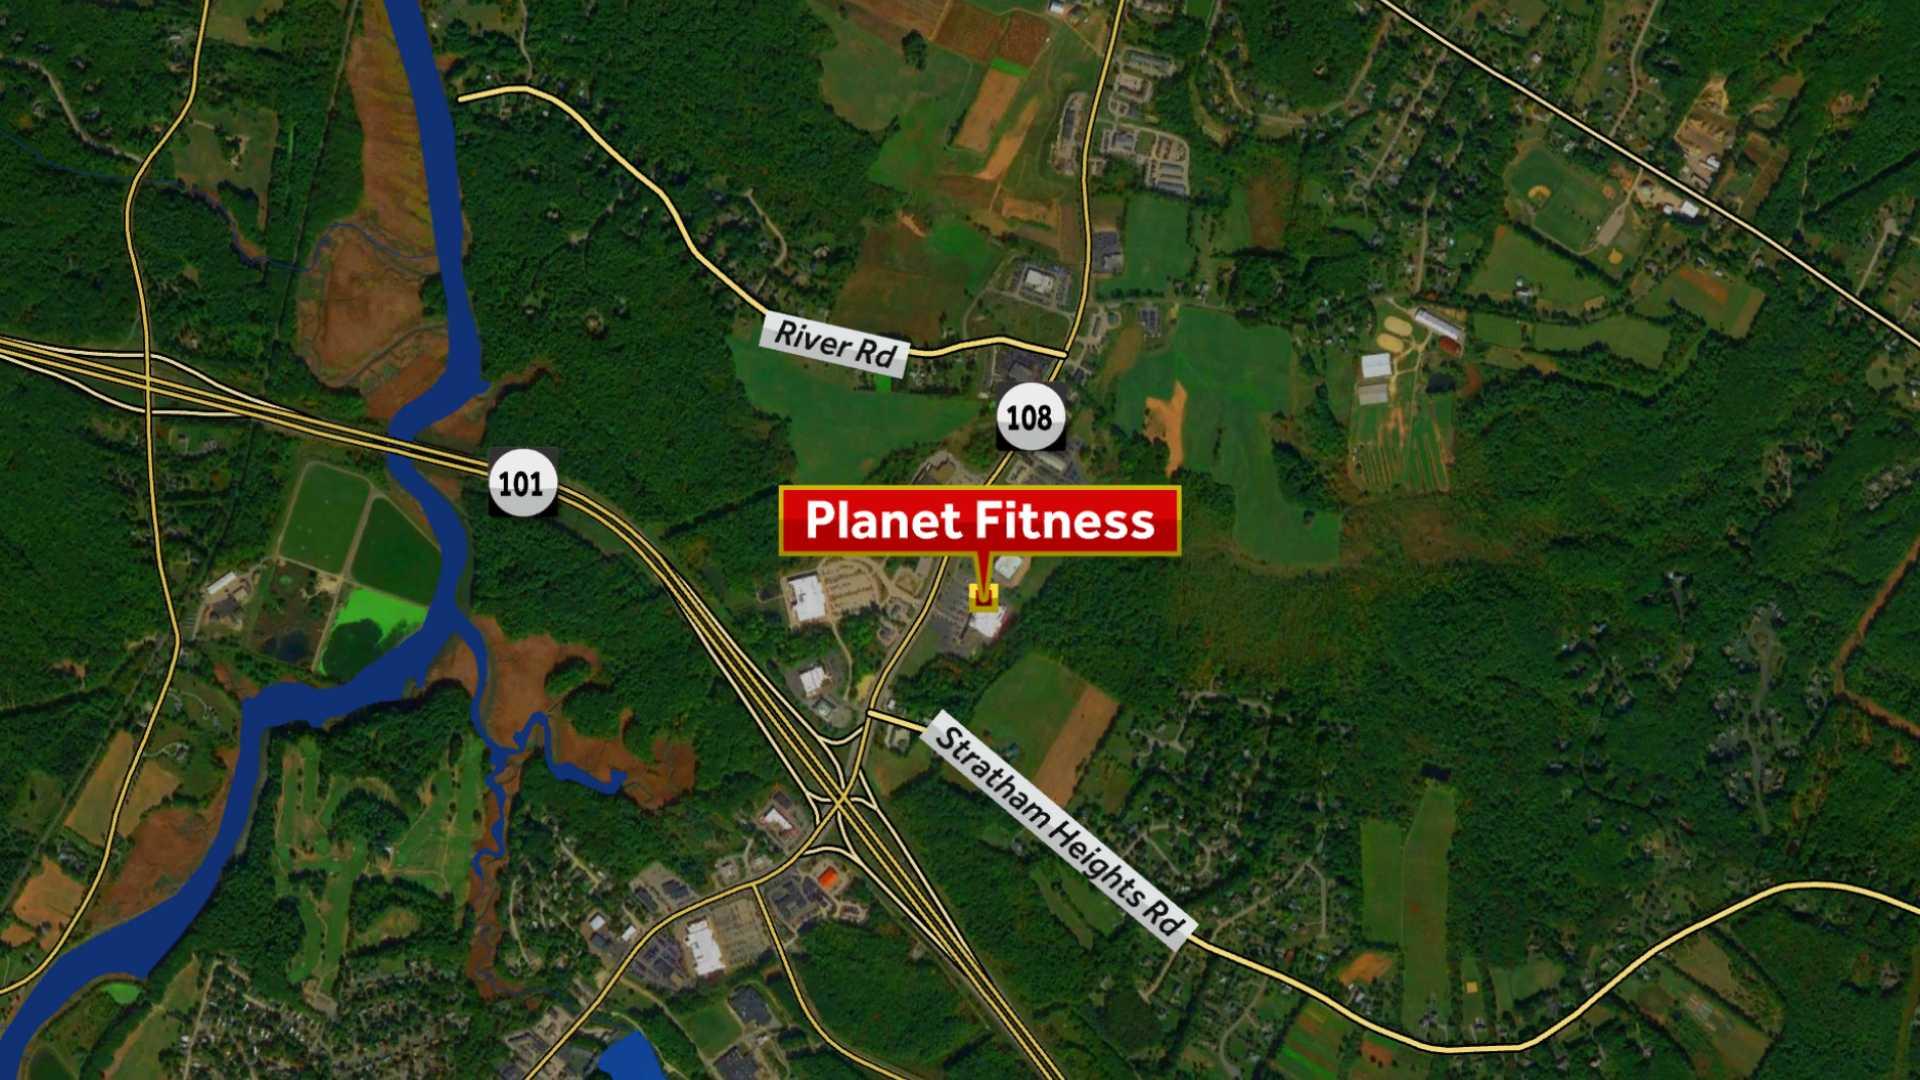 Police: Man grabbed woman in Planet Fitness locker room